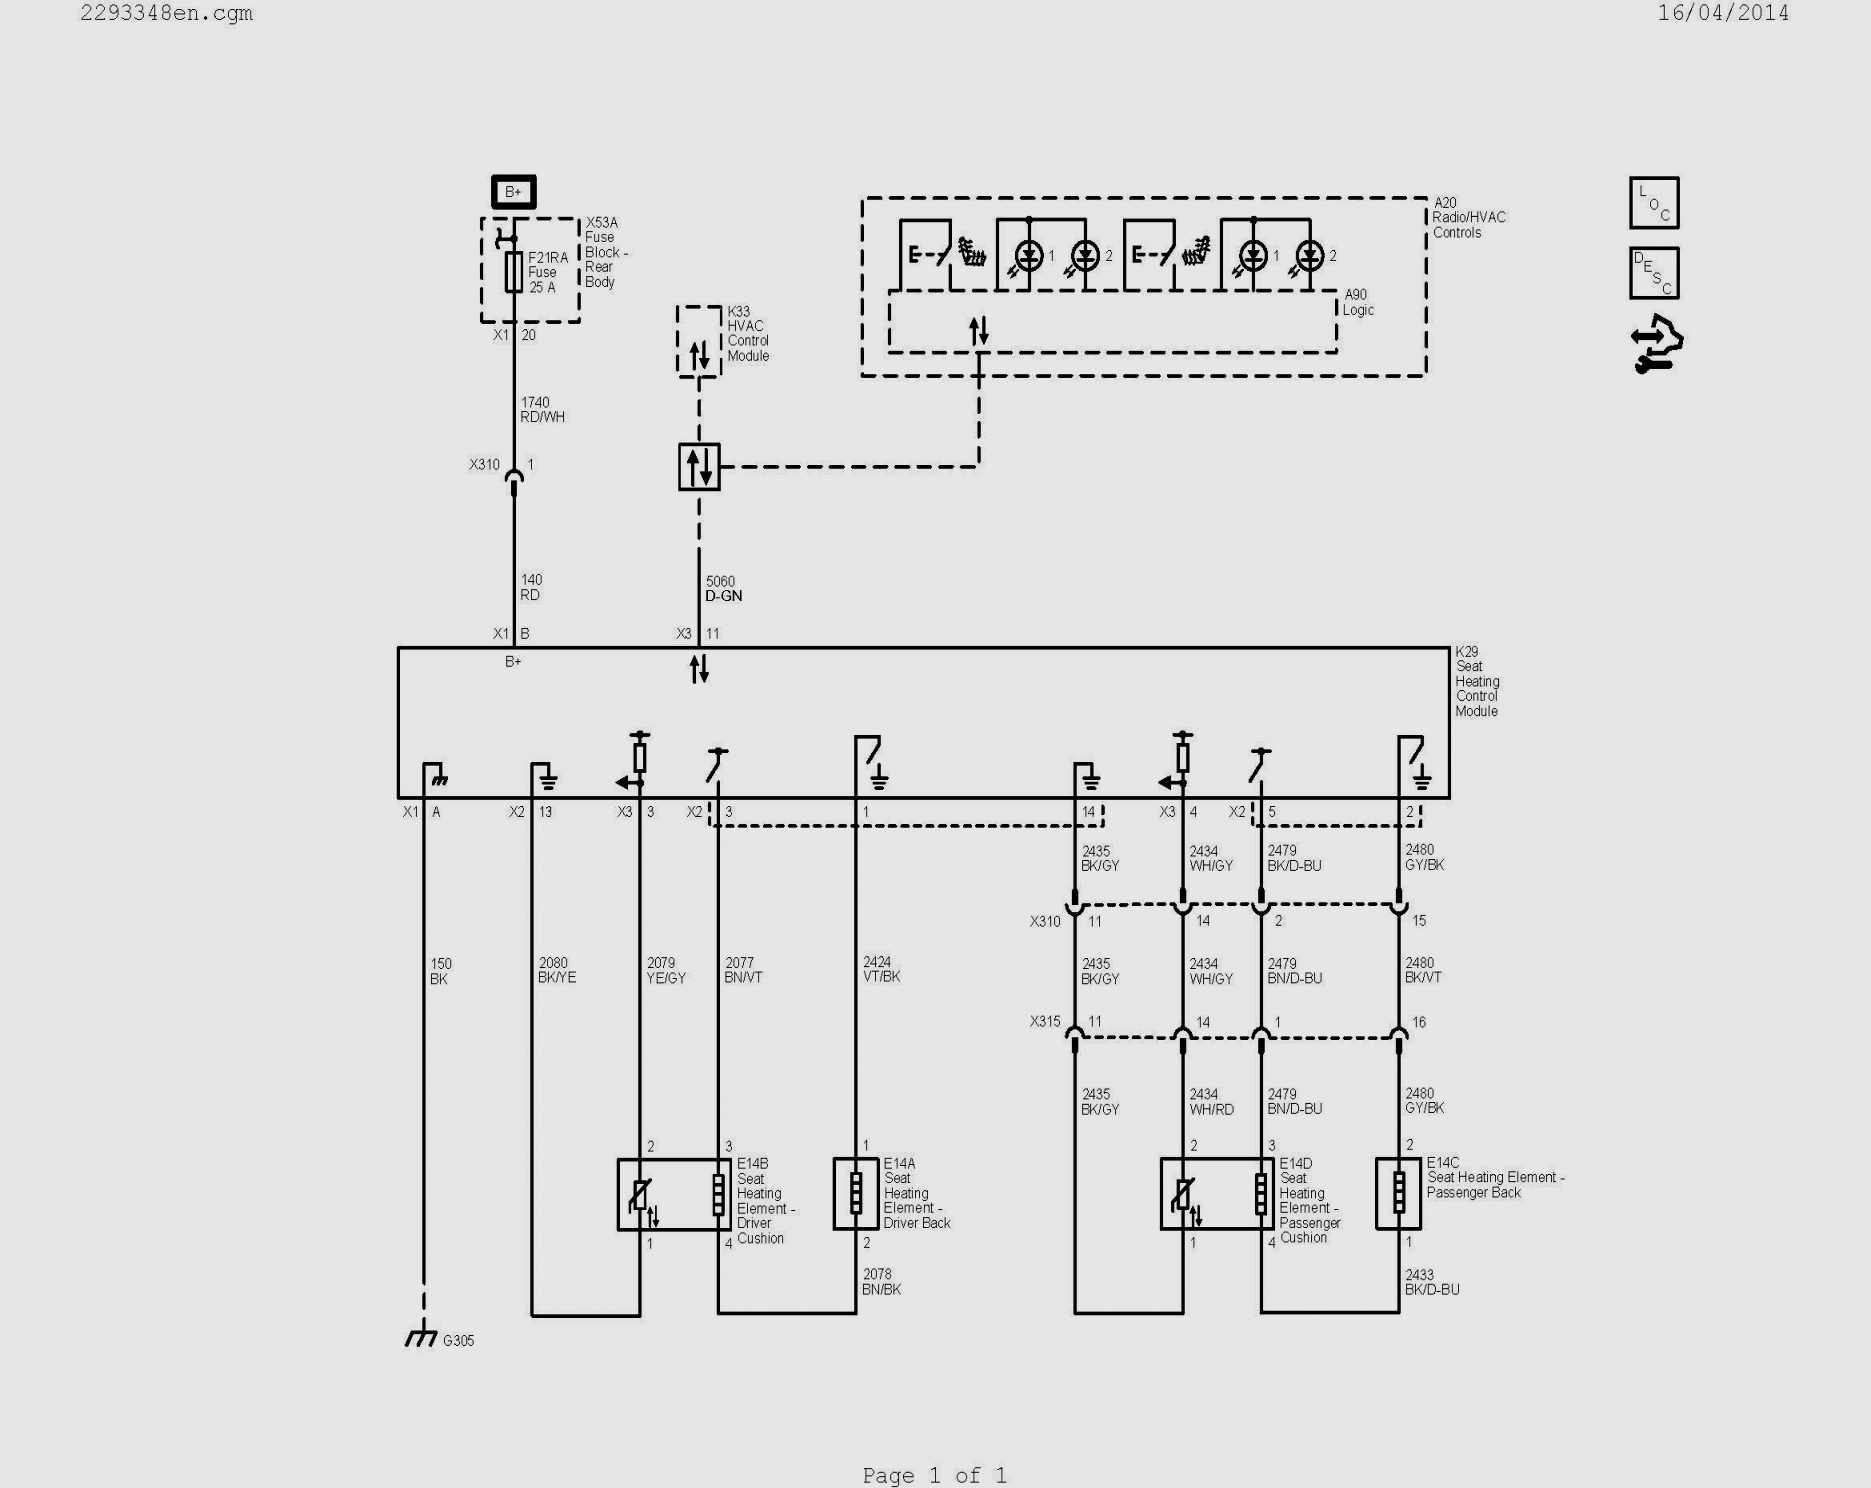 1975 corvette wiring diagram 1975 corvette wiring diagram wiring diagrams  of 1975 corvette wiring diagram 1975